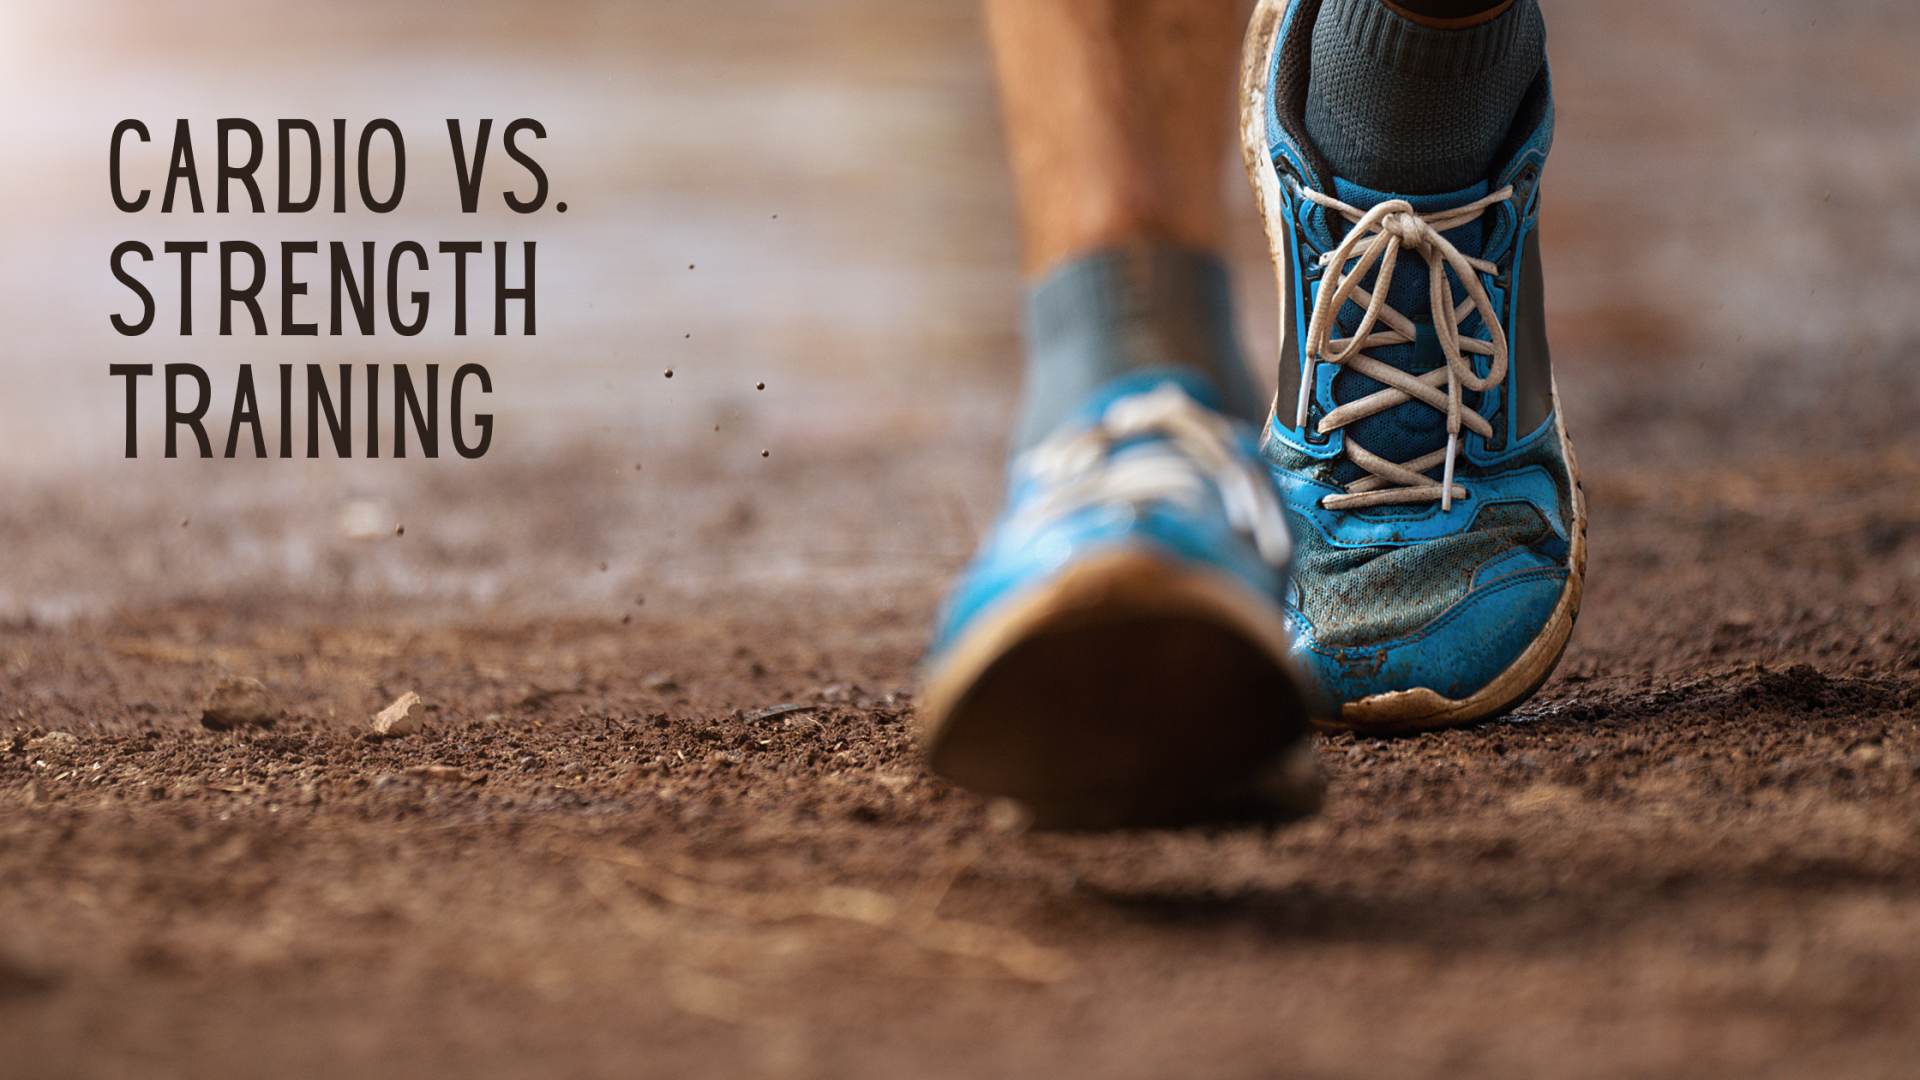 Cardio vs strength training for fat loss